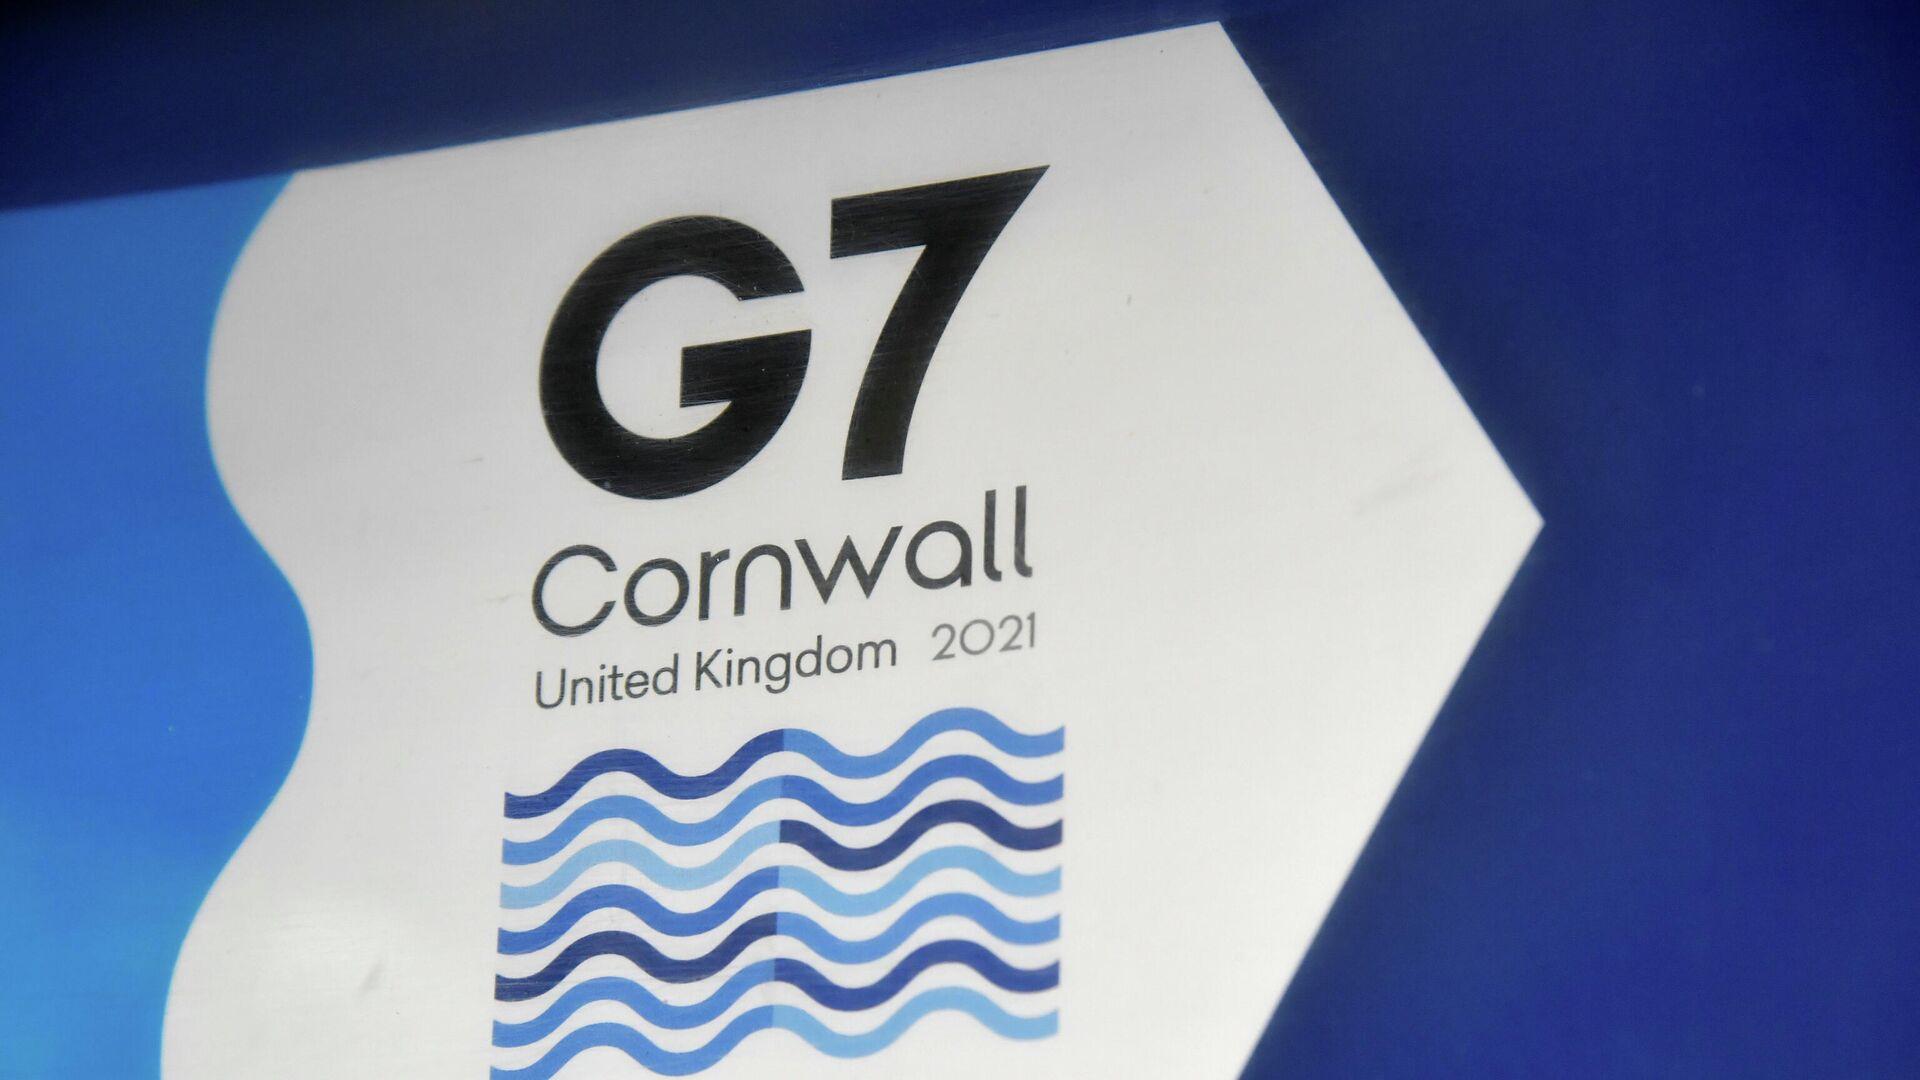 Logo de la cumbre del G7 en Cornualles, el Reino Unido - Sputnik Mundo, 1920, 13.06.2021